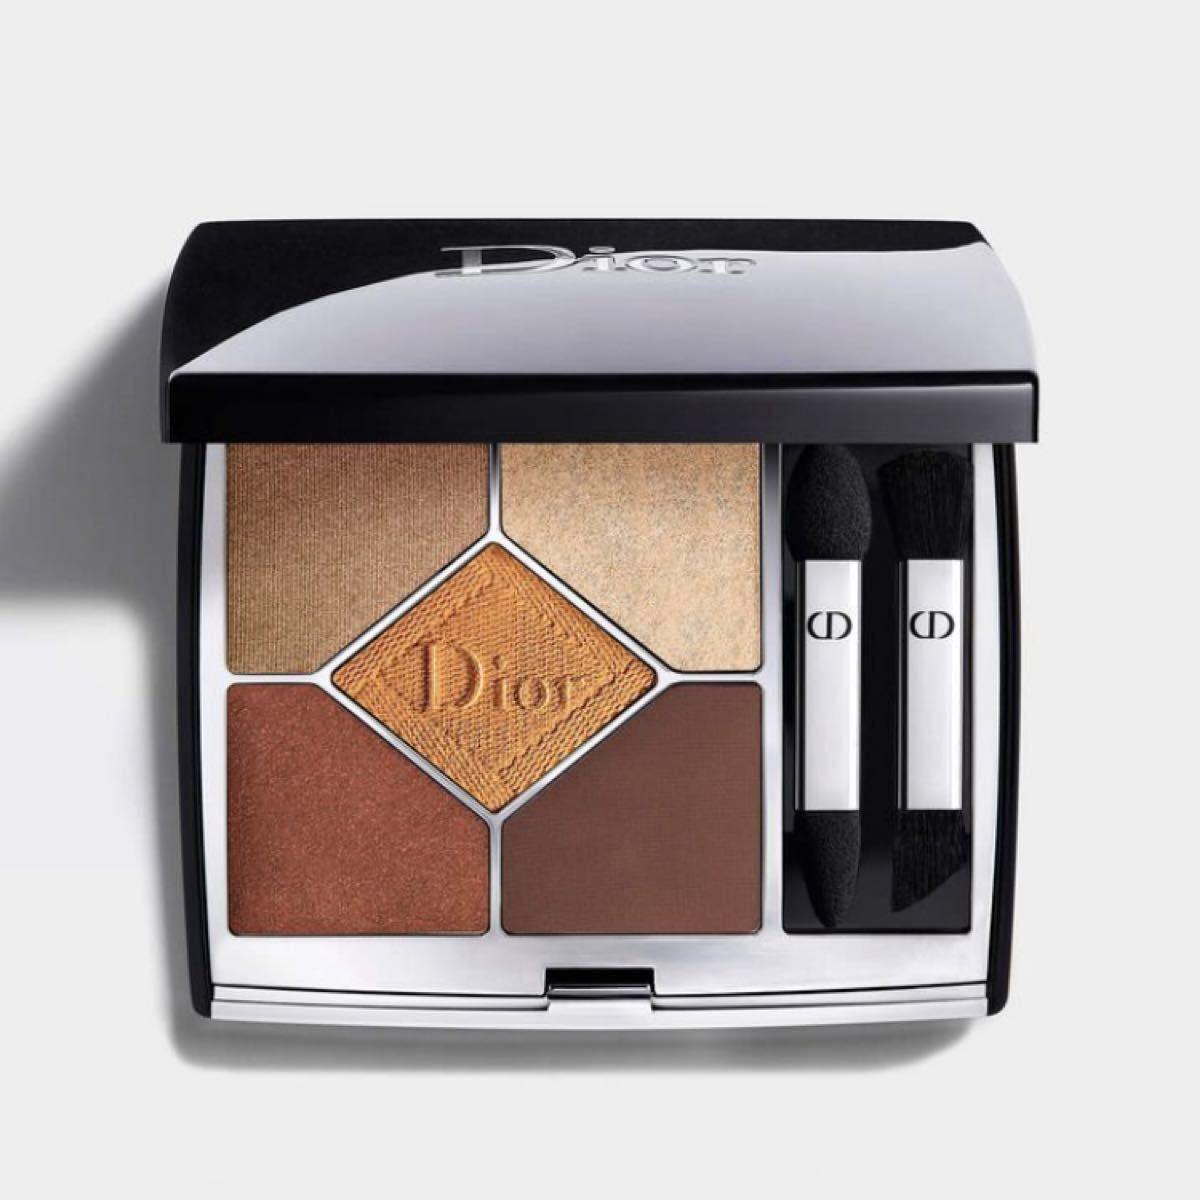 Dior ディオール サンク クルール クチュール 439 コッパー アイシャドウ サンククルール 新色 パレット ショッパー付袋